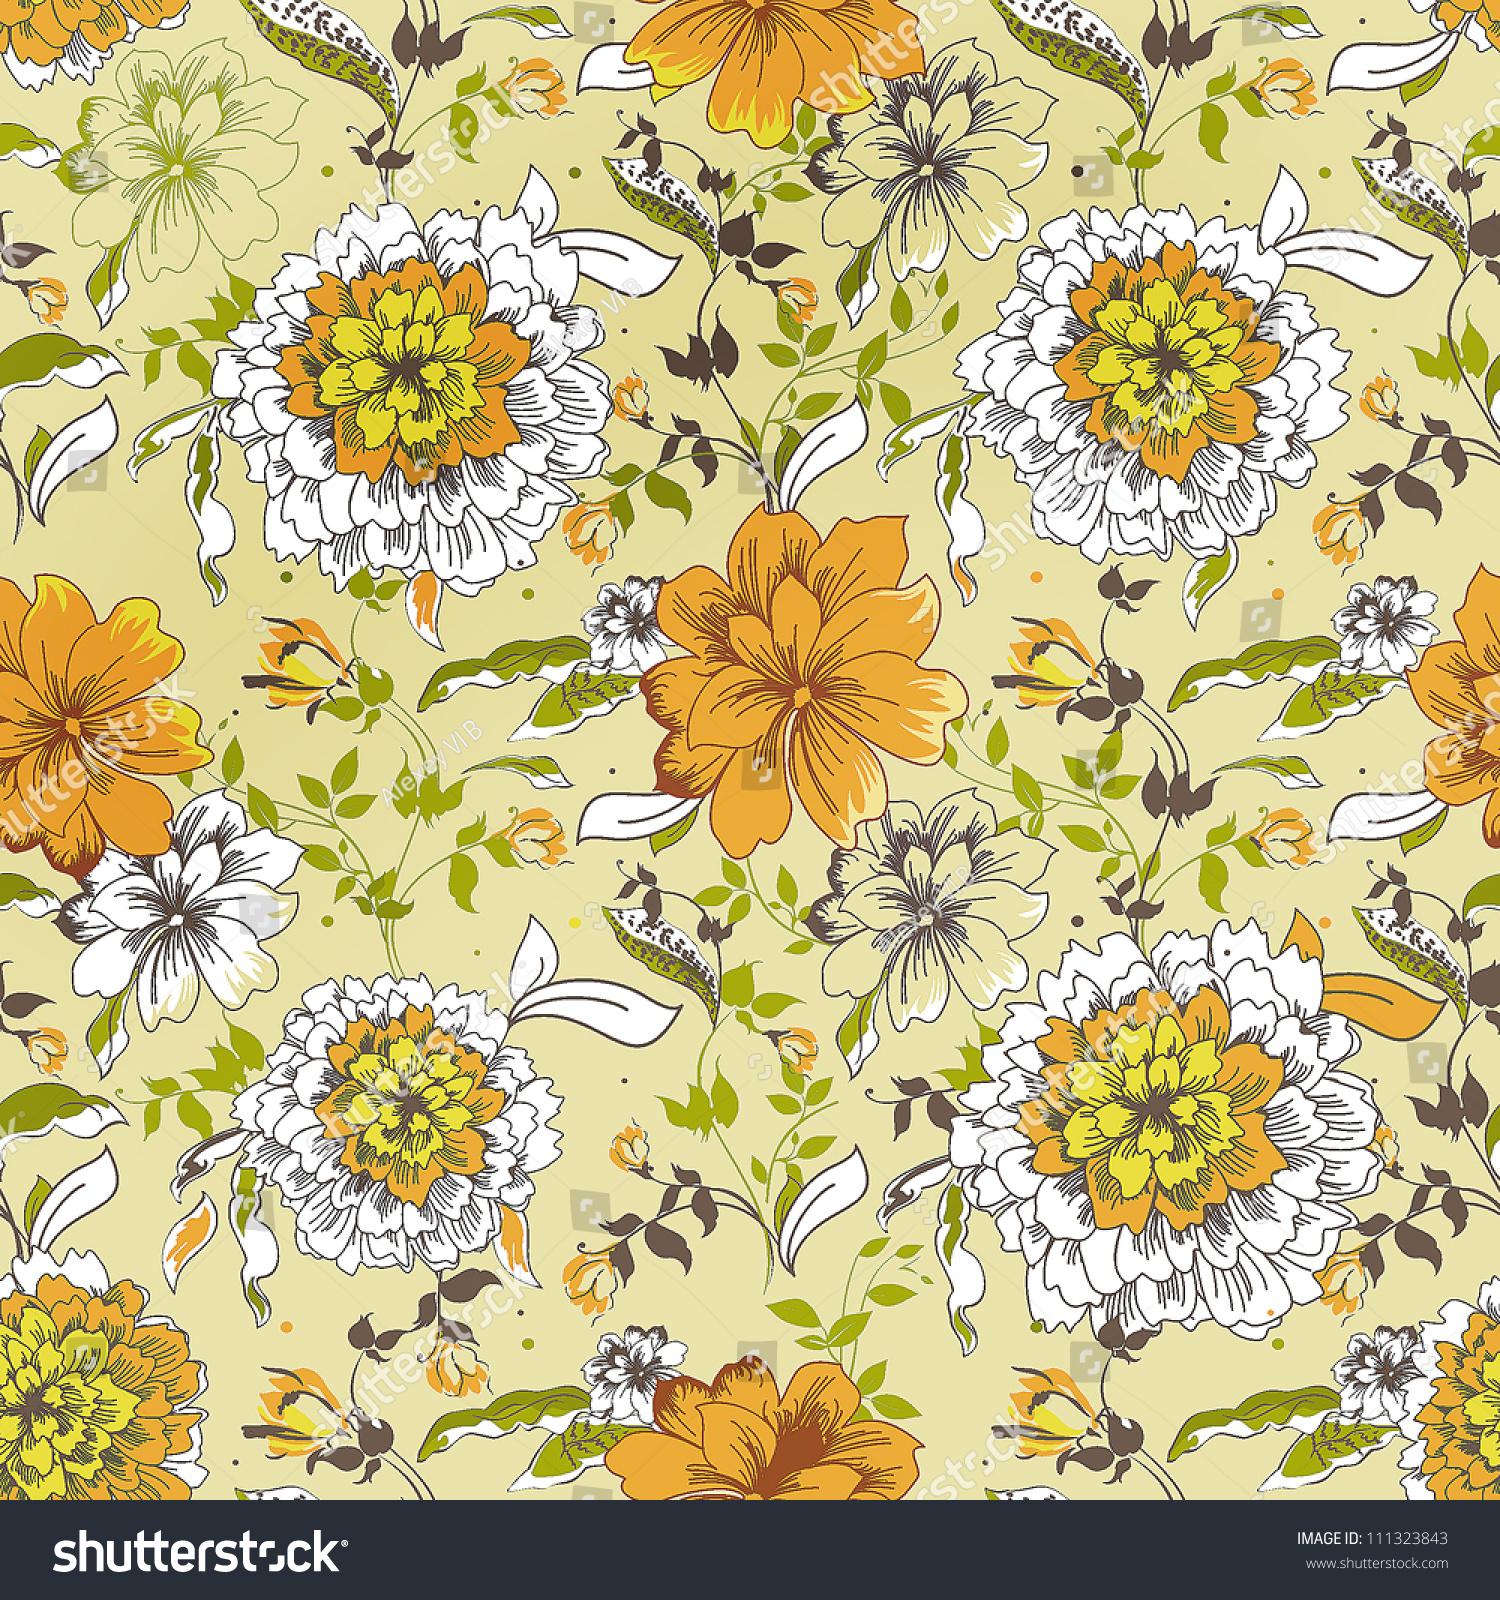 Floral Fabric Vintage Wallpaper Cute Backdrop Stock Vector